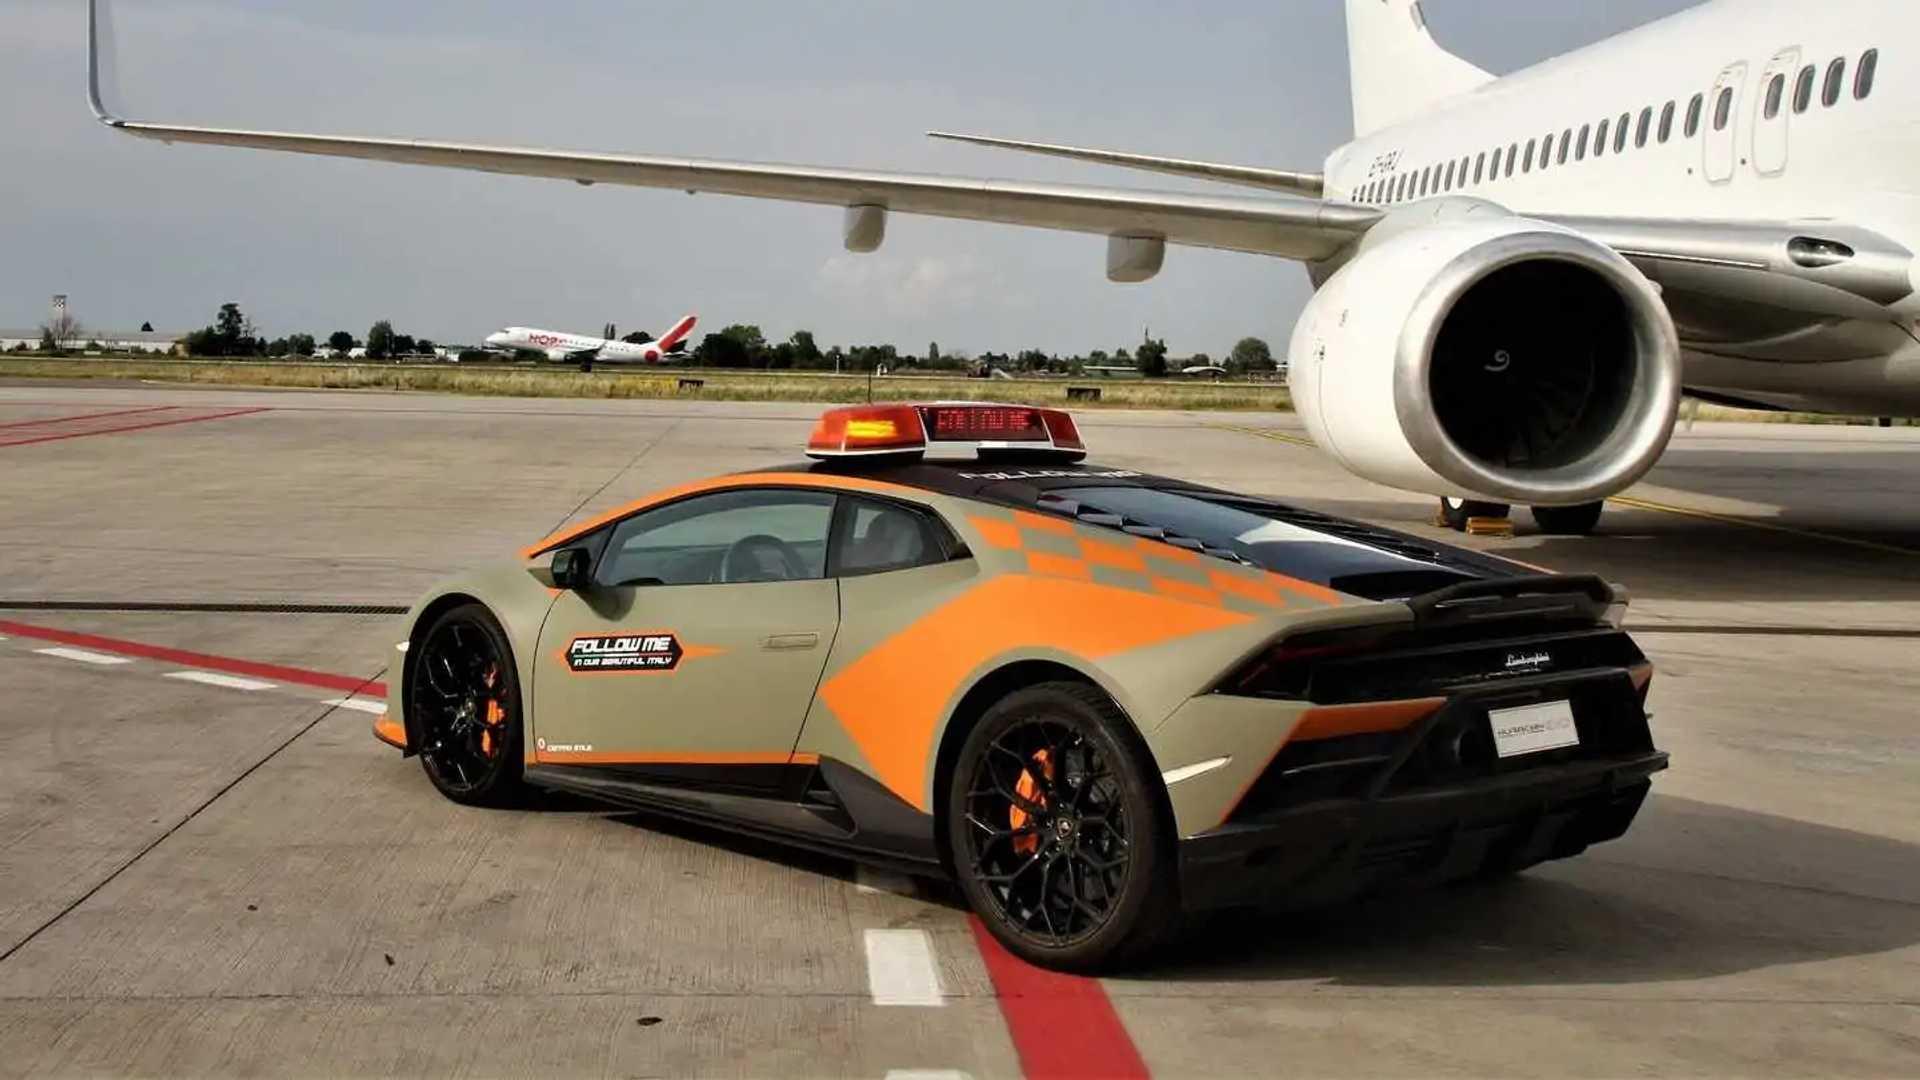 Lamborghini Huracan Evo Follow-Me Car